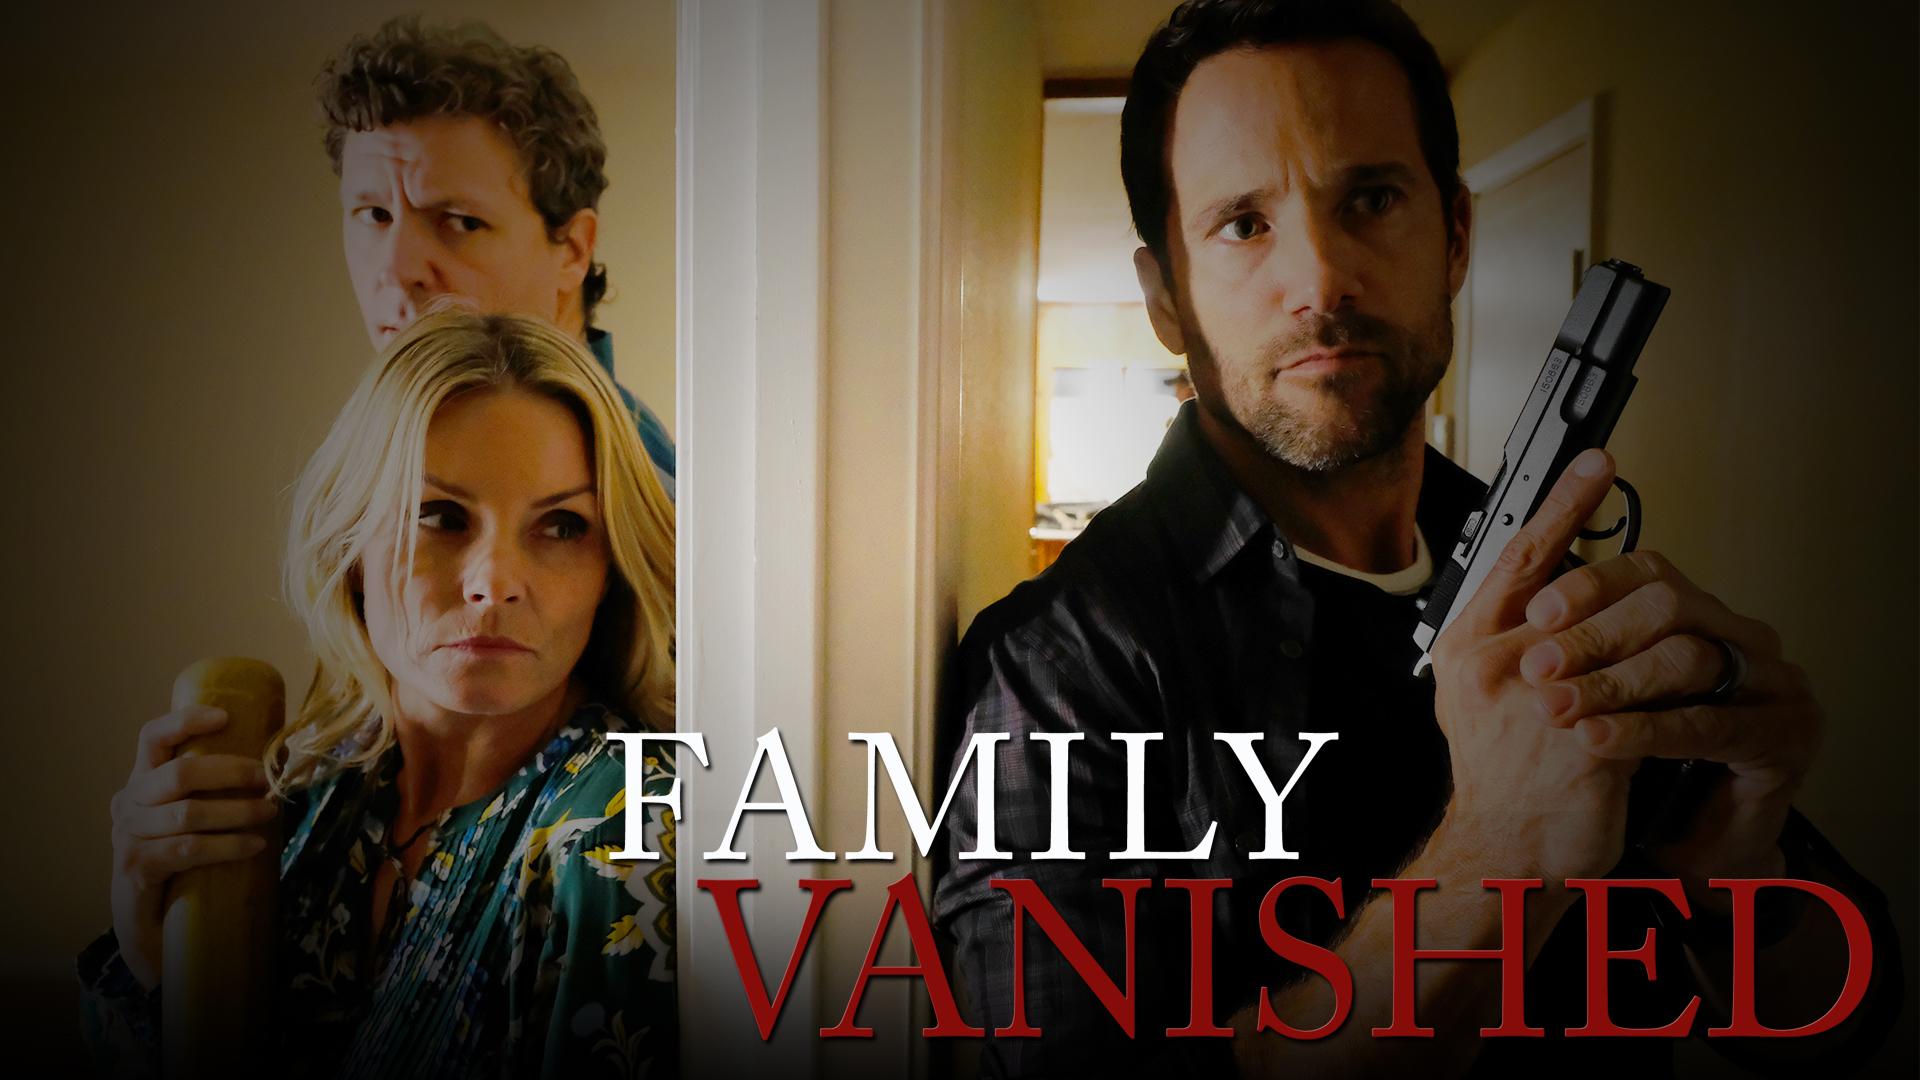 Family Vanished